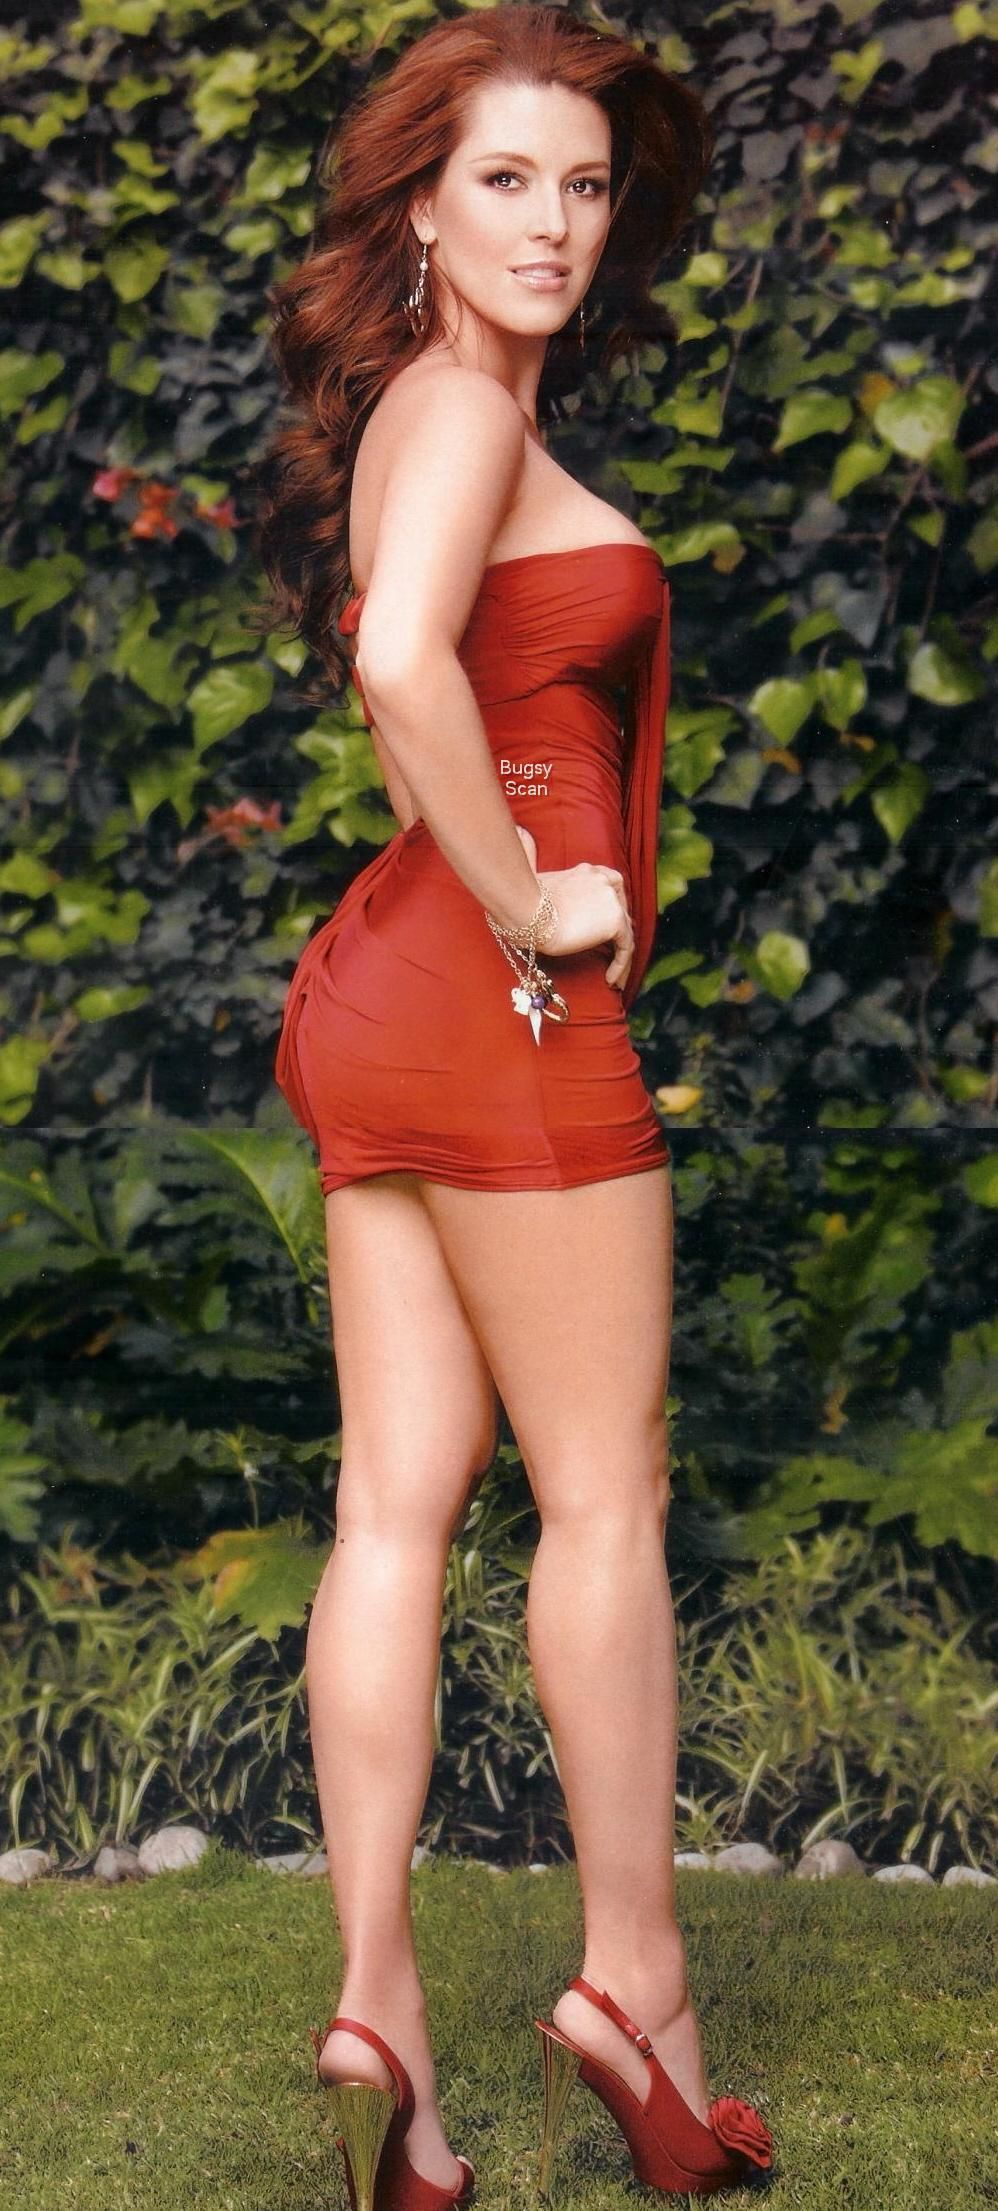 Mariah carey topless beach